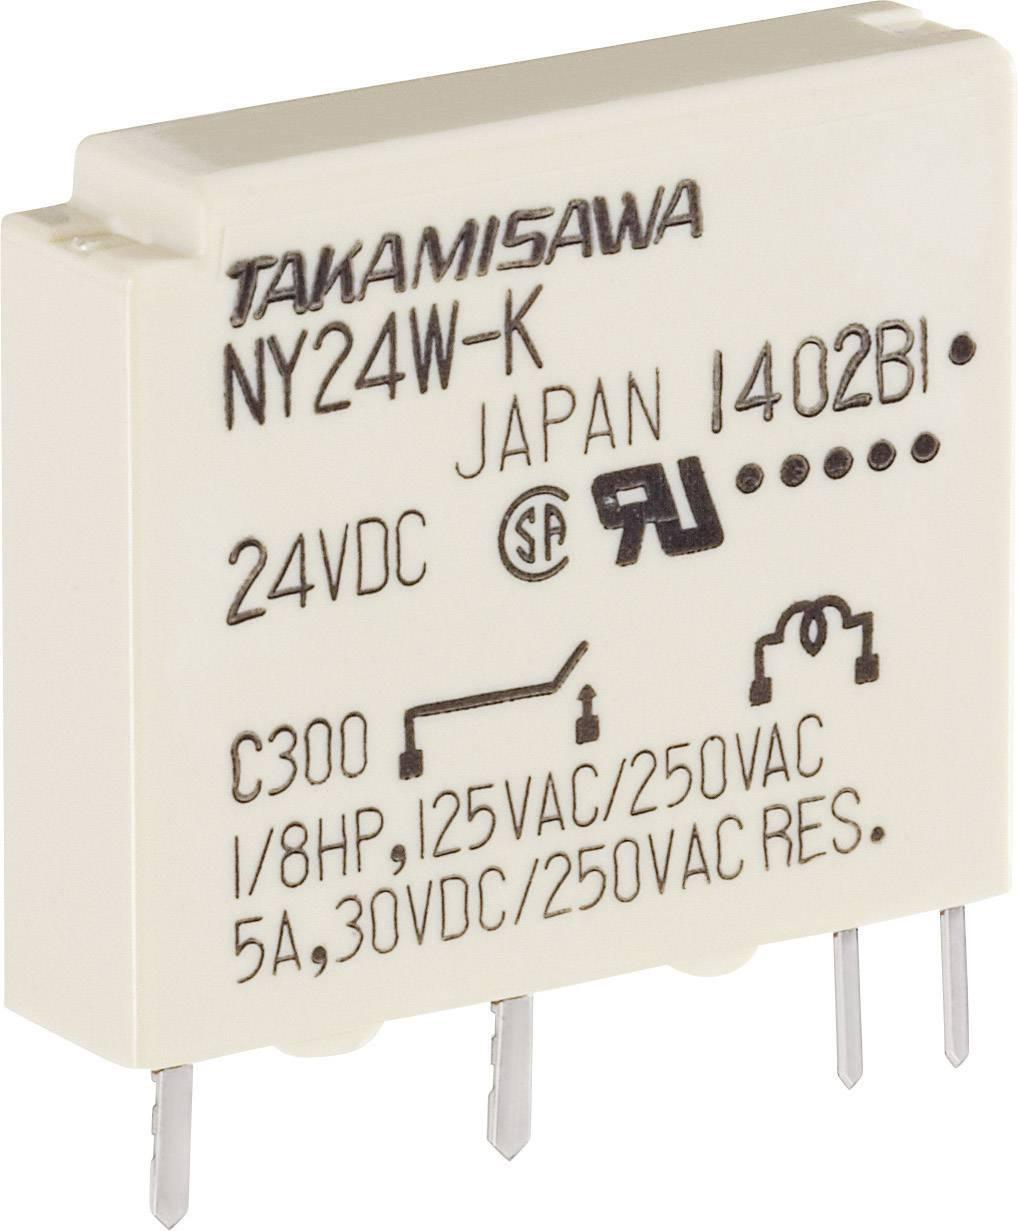 Takamisawa SY-12W-K Printrelais 12 V//DC 1 A 1 Wechsler 1 St.